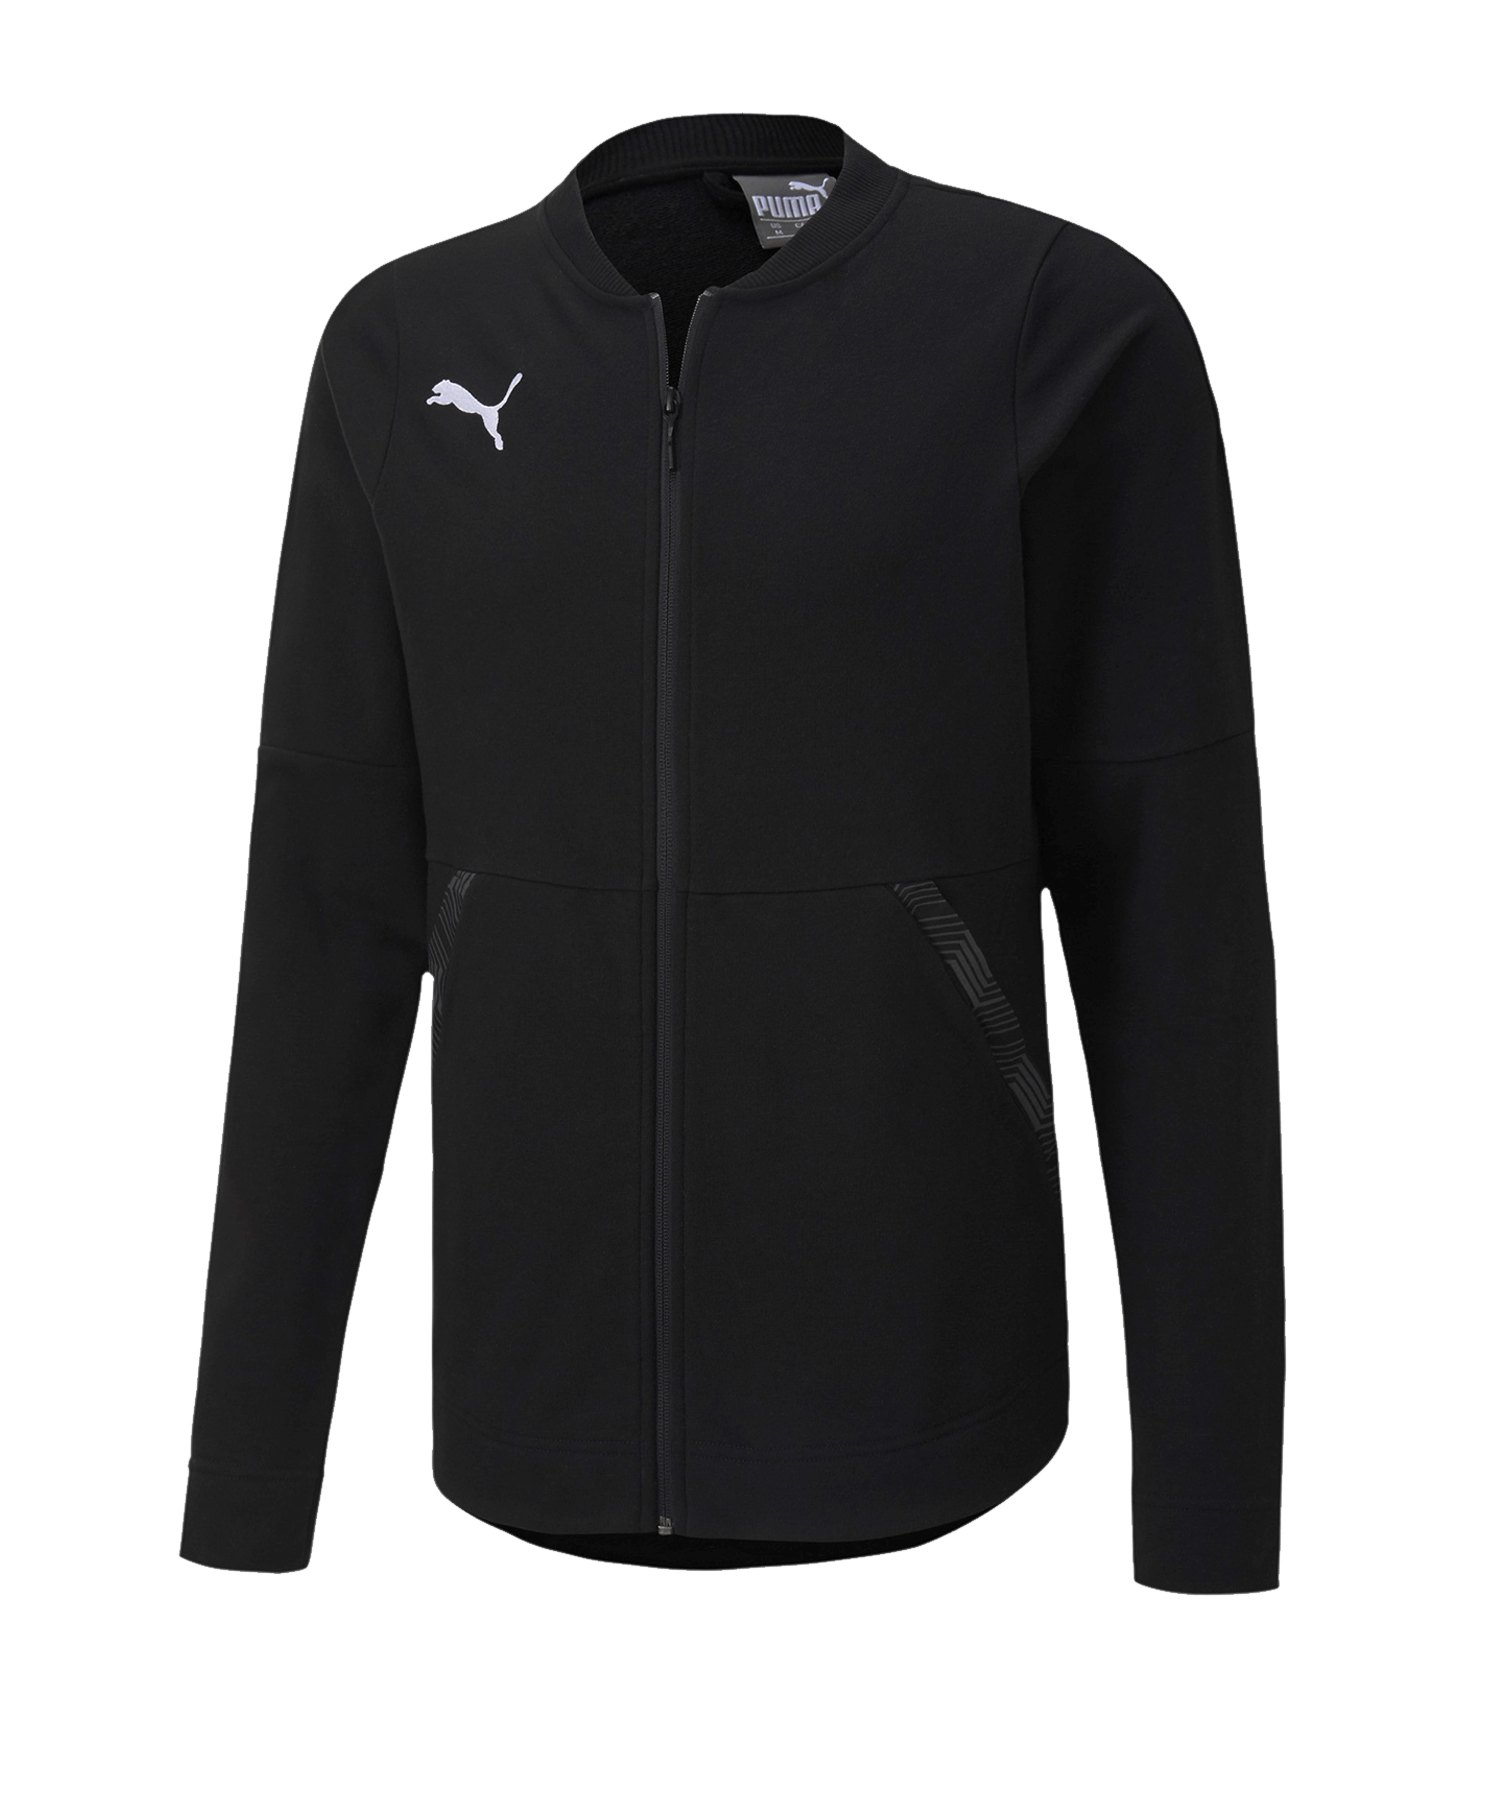 PUMA teamFINAL 21 Casuals Jacket Jacke Schwarz F03 - schwarz